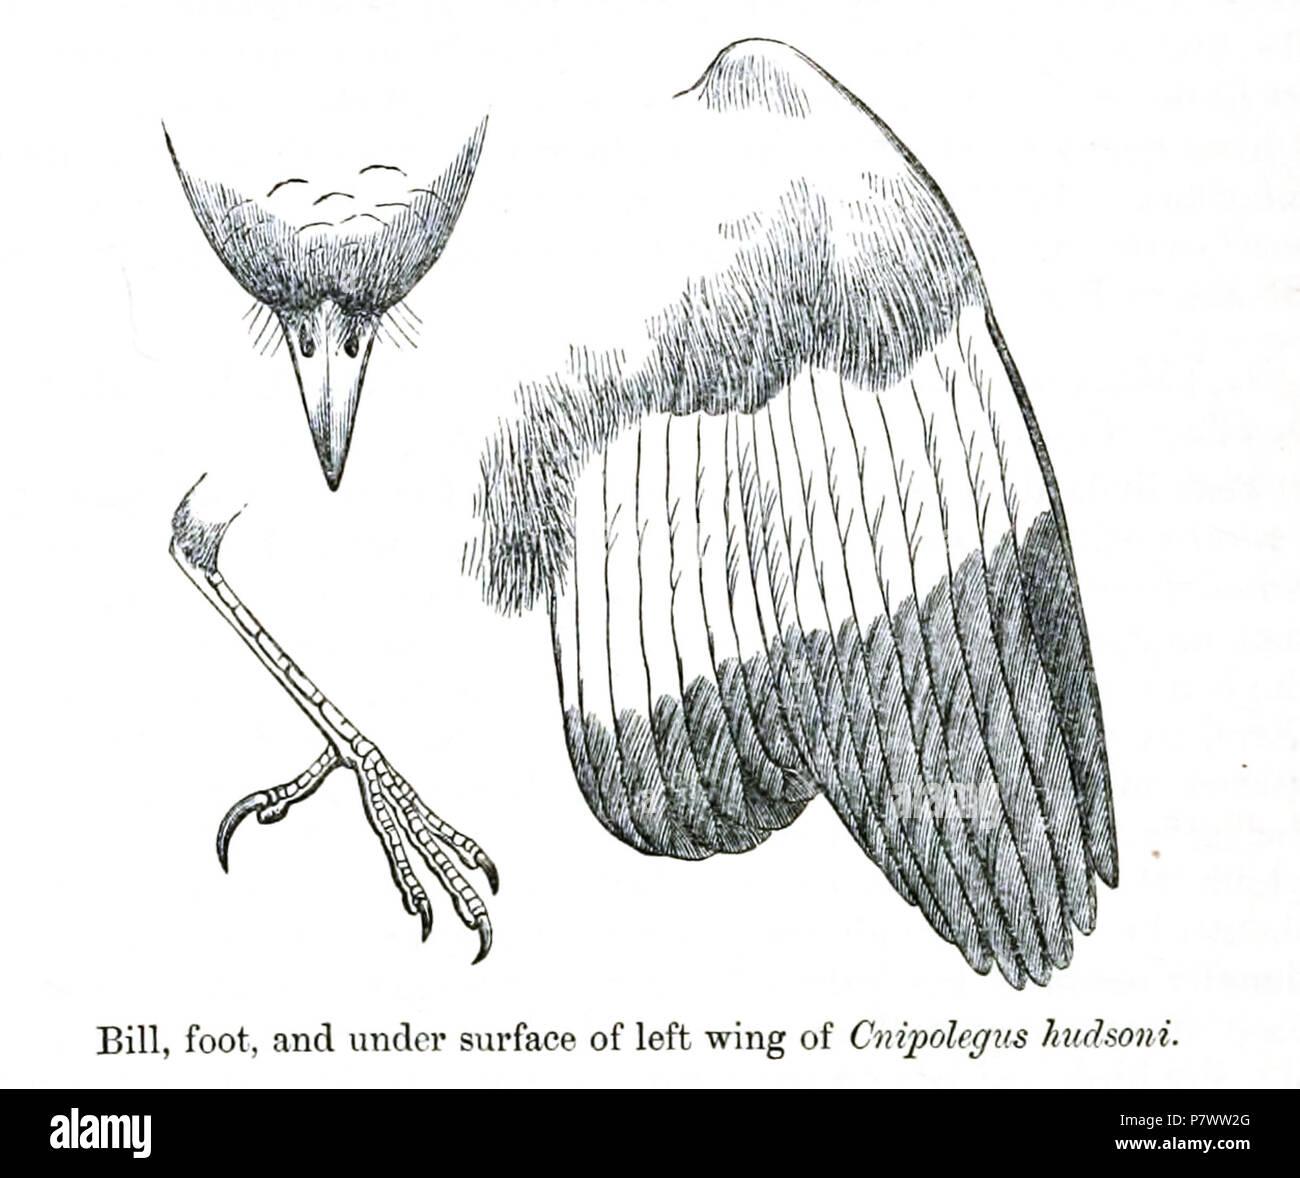 Cnipolegus hudsoni = Knipolegus hudsoni (Sharpe, 1870),  English: Hudson's Black-tyrant, male: left wing from ventral, beak from dorsal and foot from lateral . 1872 (published 1873) 93 CnipolegusHudsoniDetail - Stock Image